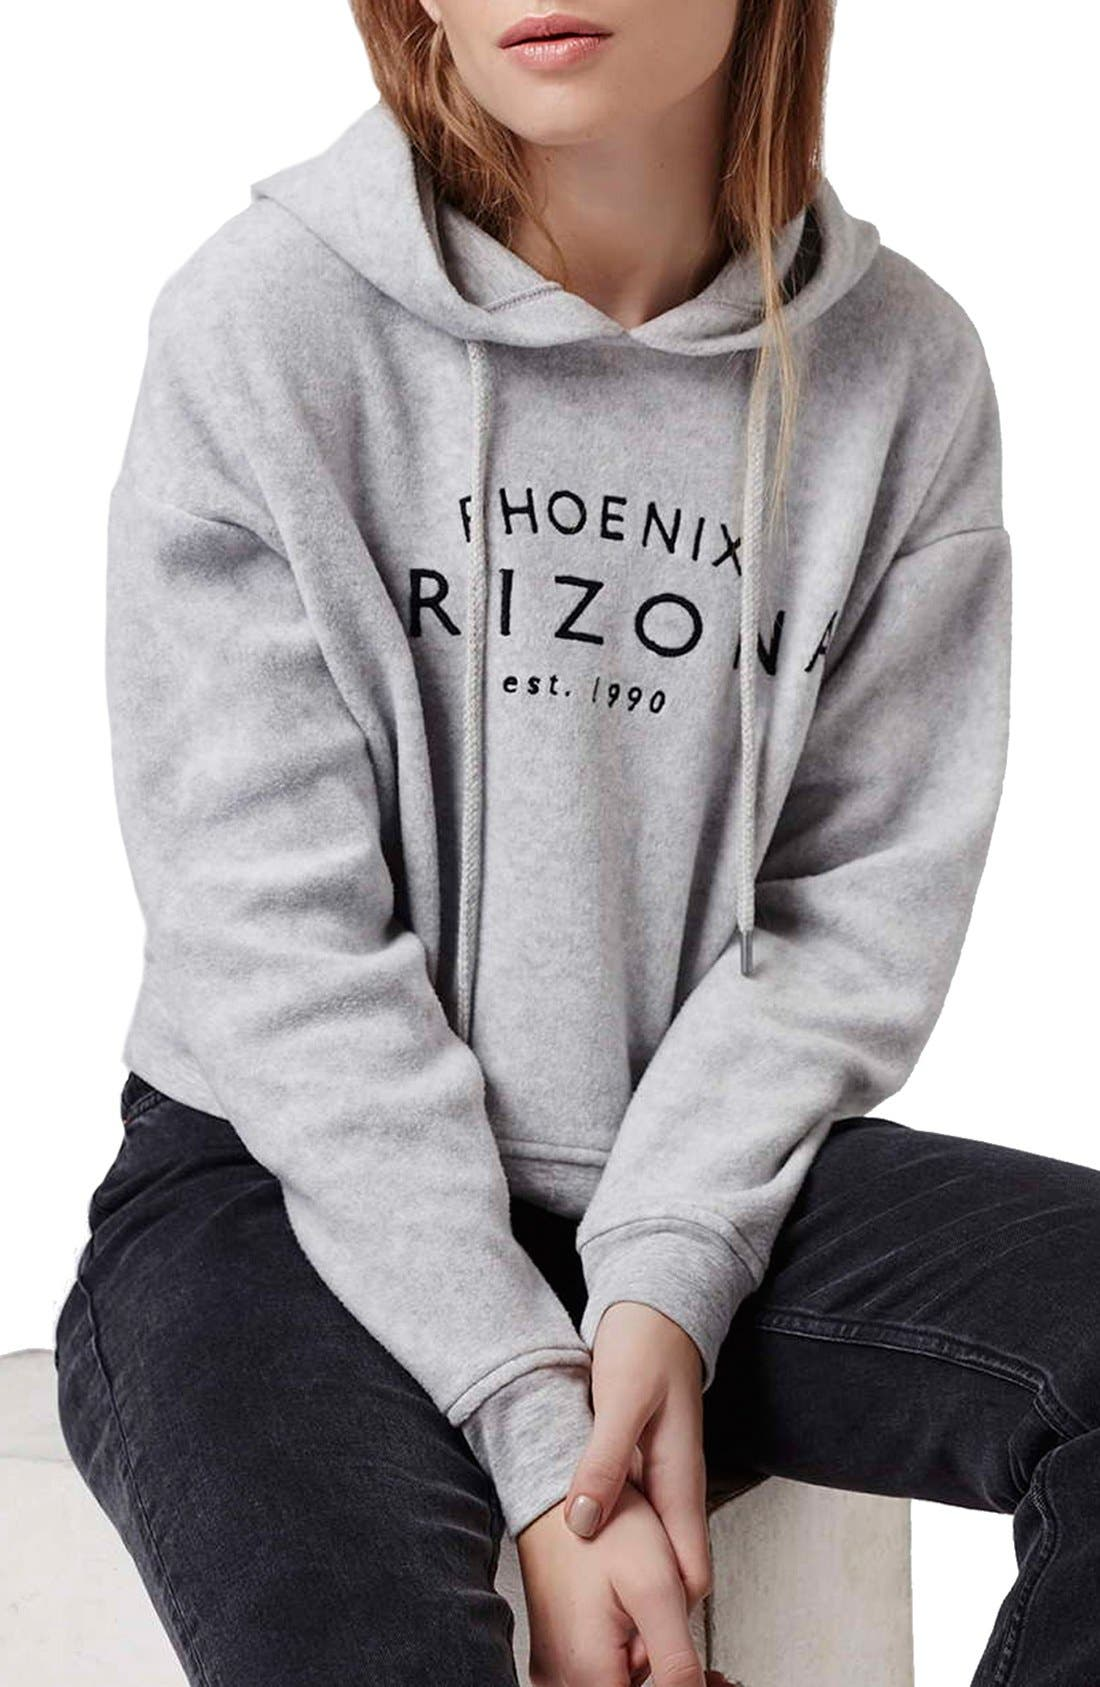 Alternate Image 1 Selected - Topshop 'Arizona' Embroidered Brushed Fleece Hoodie